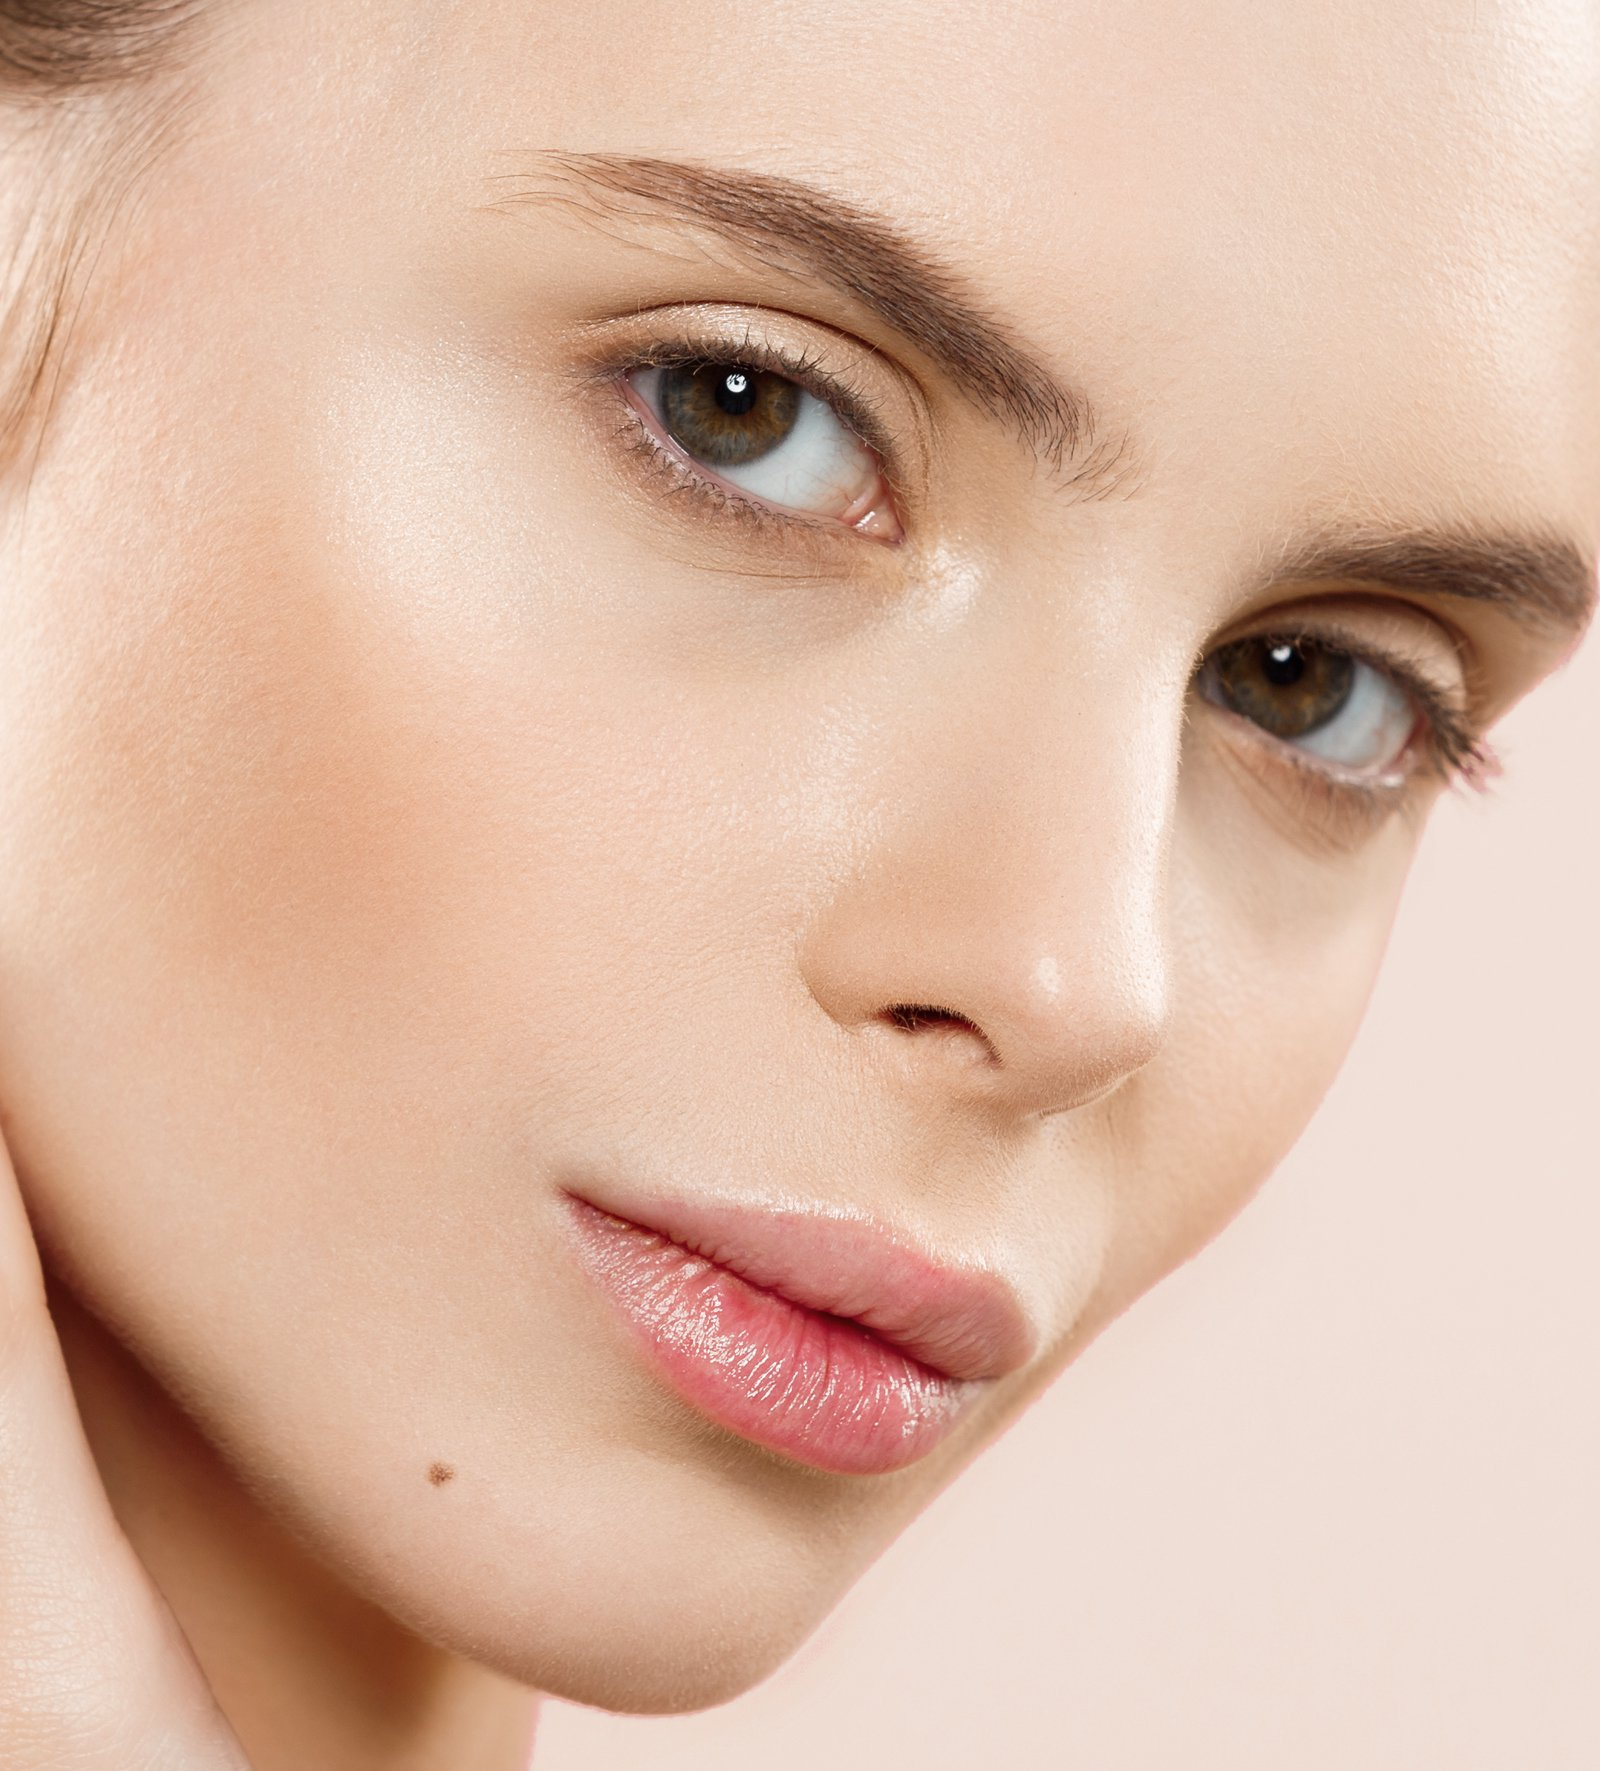 chirurgie esthétique faciale rabat maroc